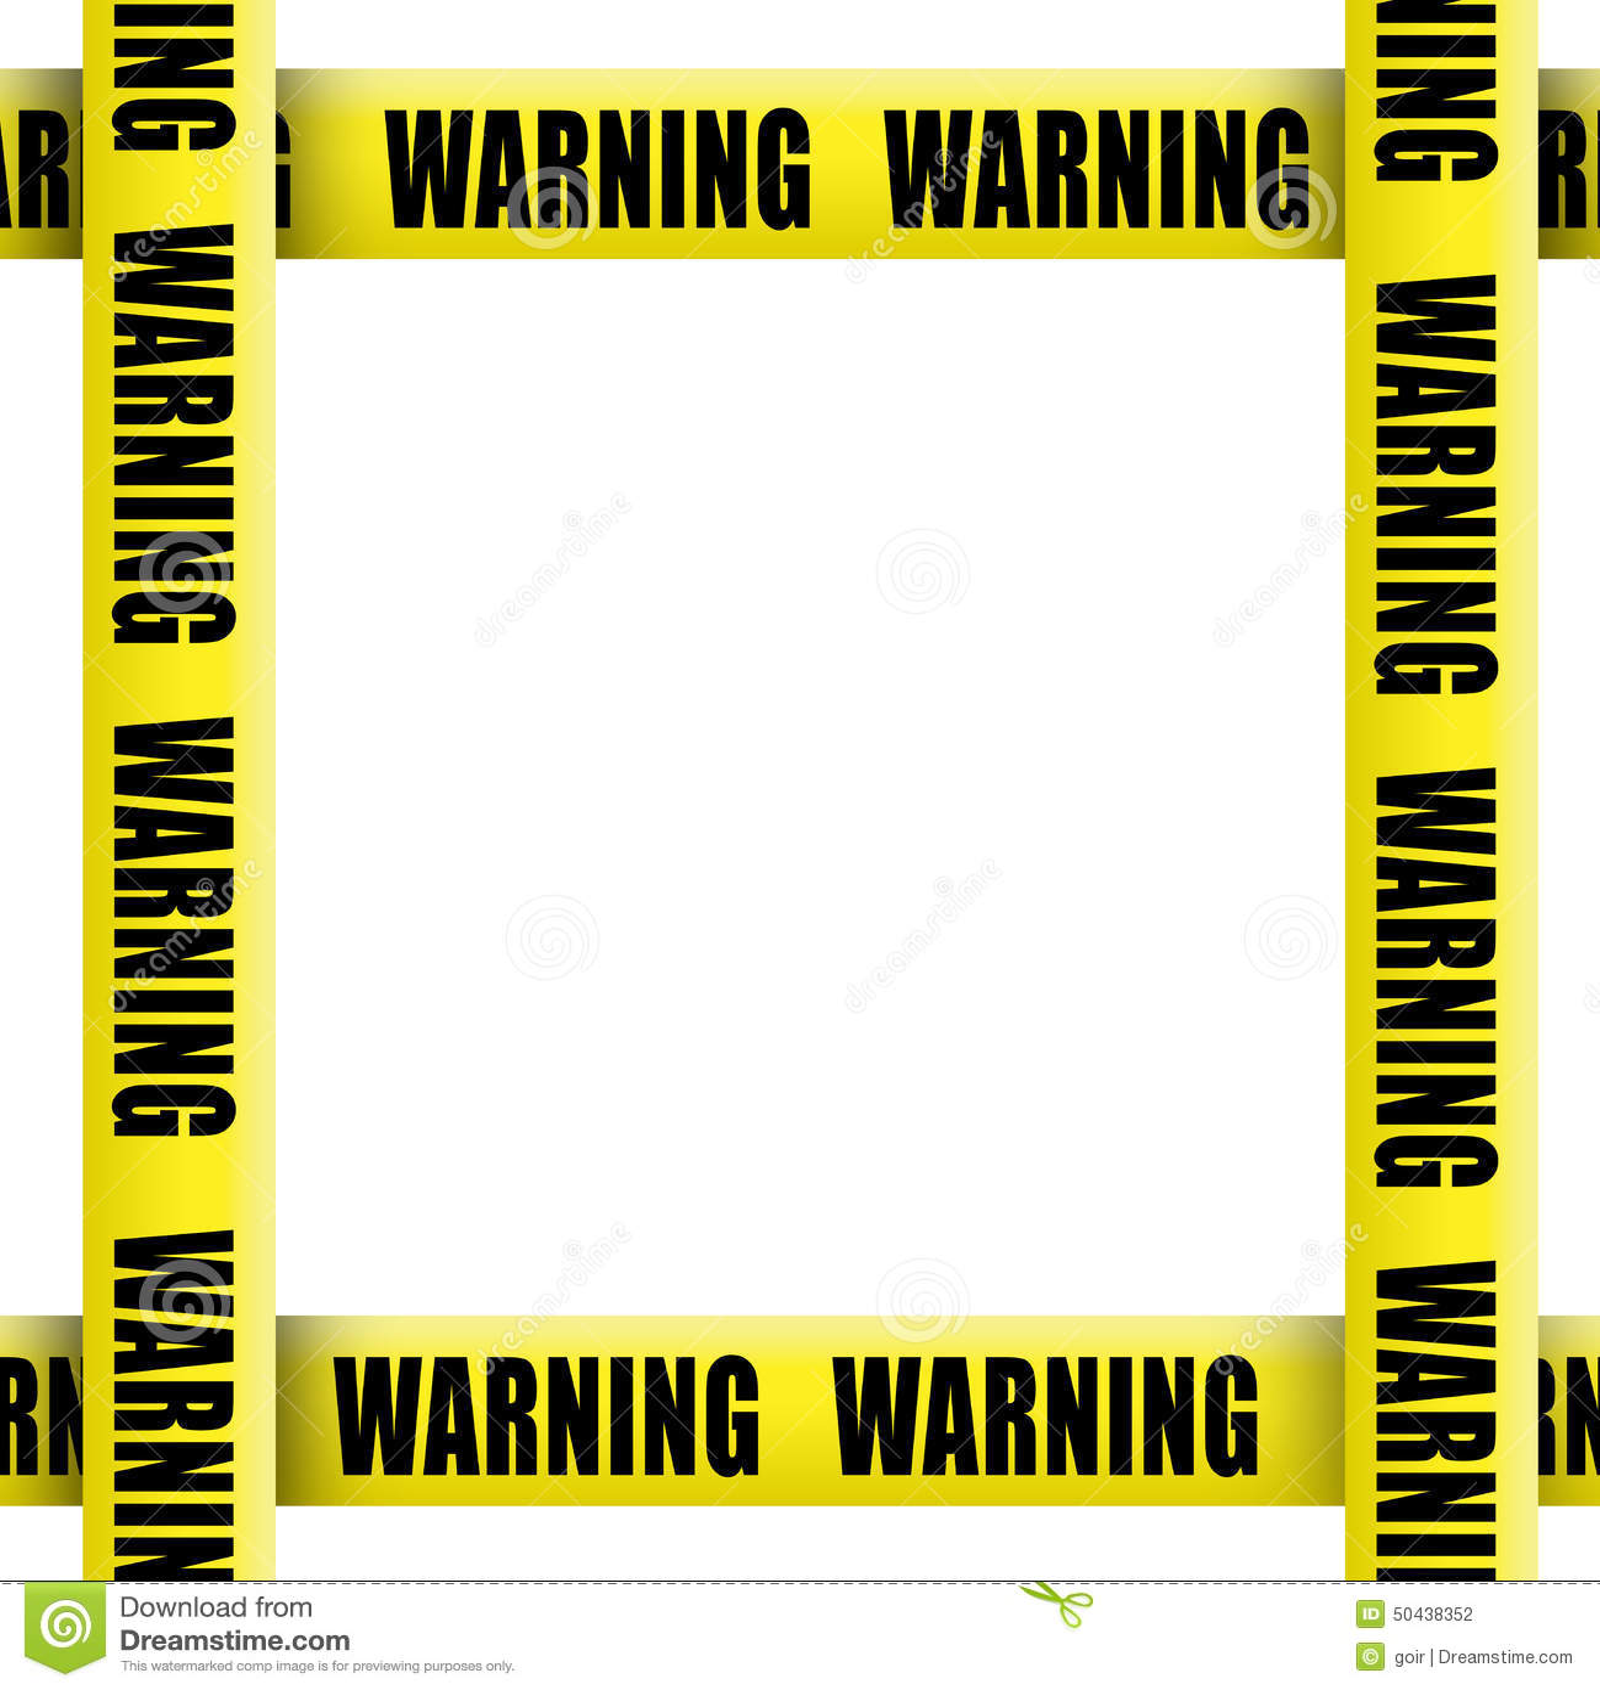 Warning Tape Frame Stock Photo - Image: 50438352